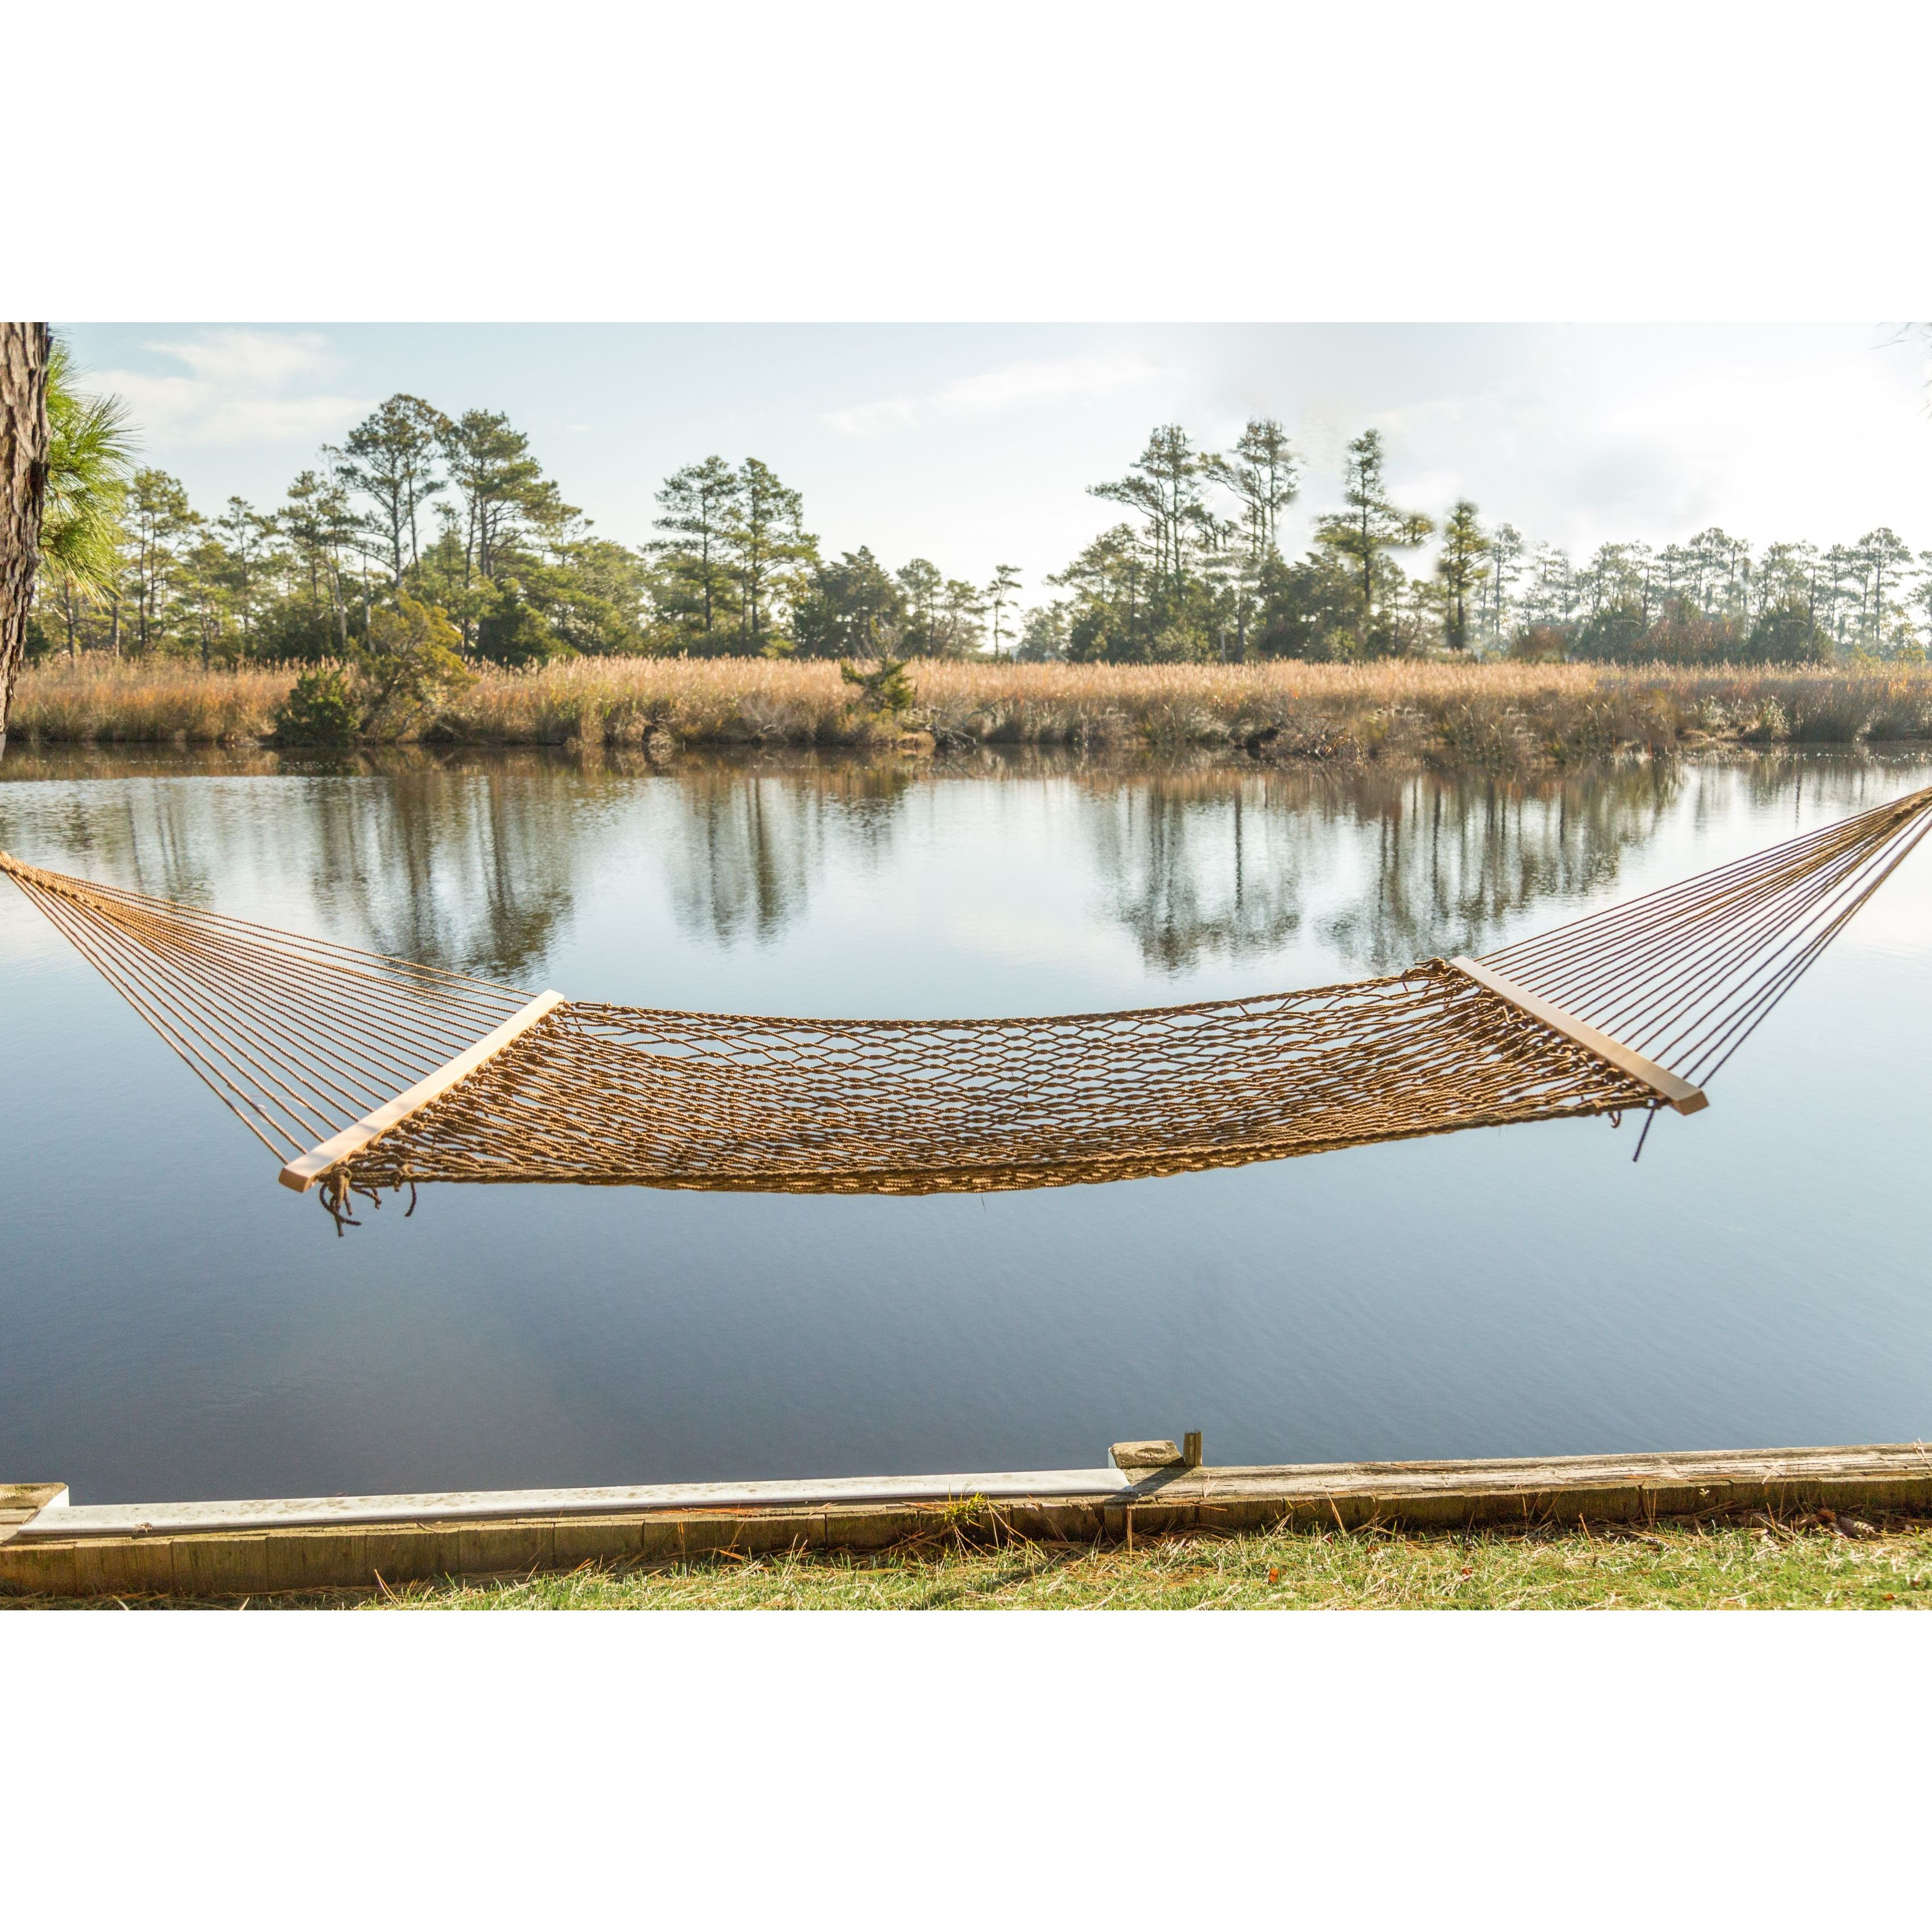 trunk swing zero rope outdoor tan woven divider main hammock room brown gravity wood living chair